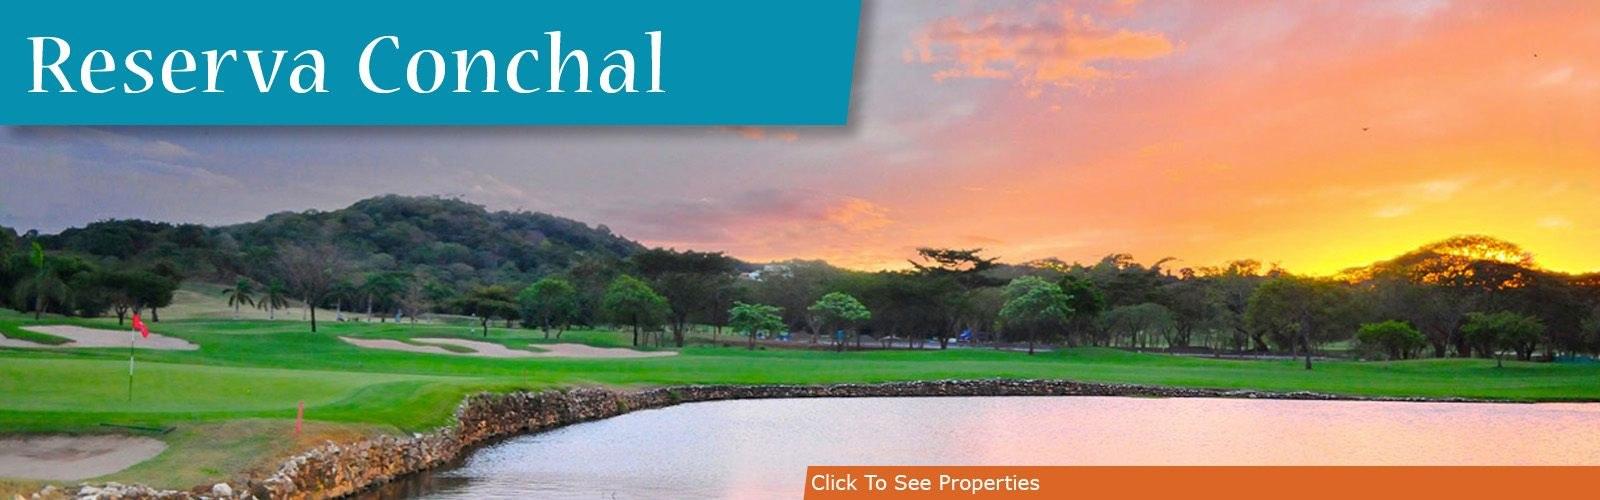 Reserva Conchal in Guancaste, Costa Rica Overseas Pacific Realty